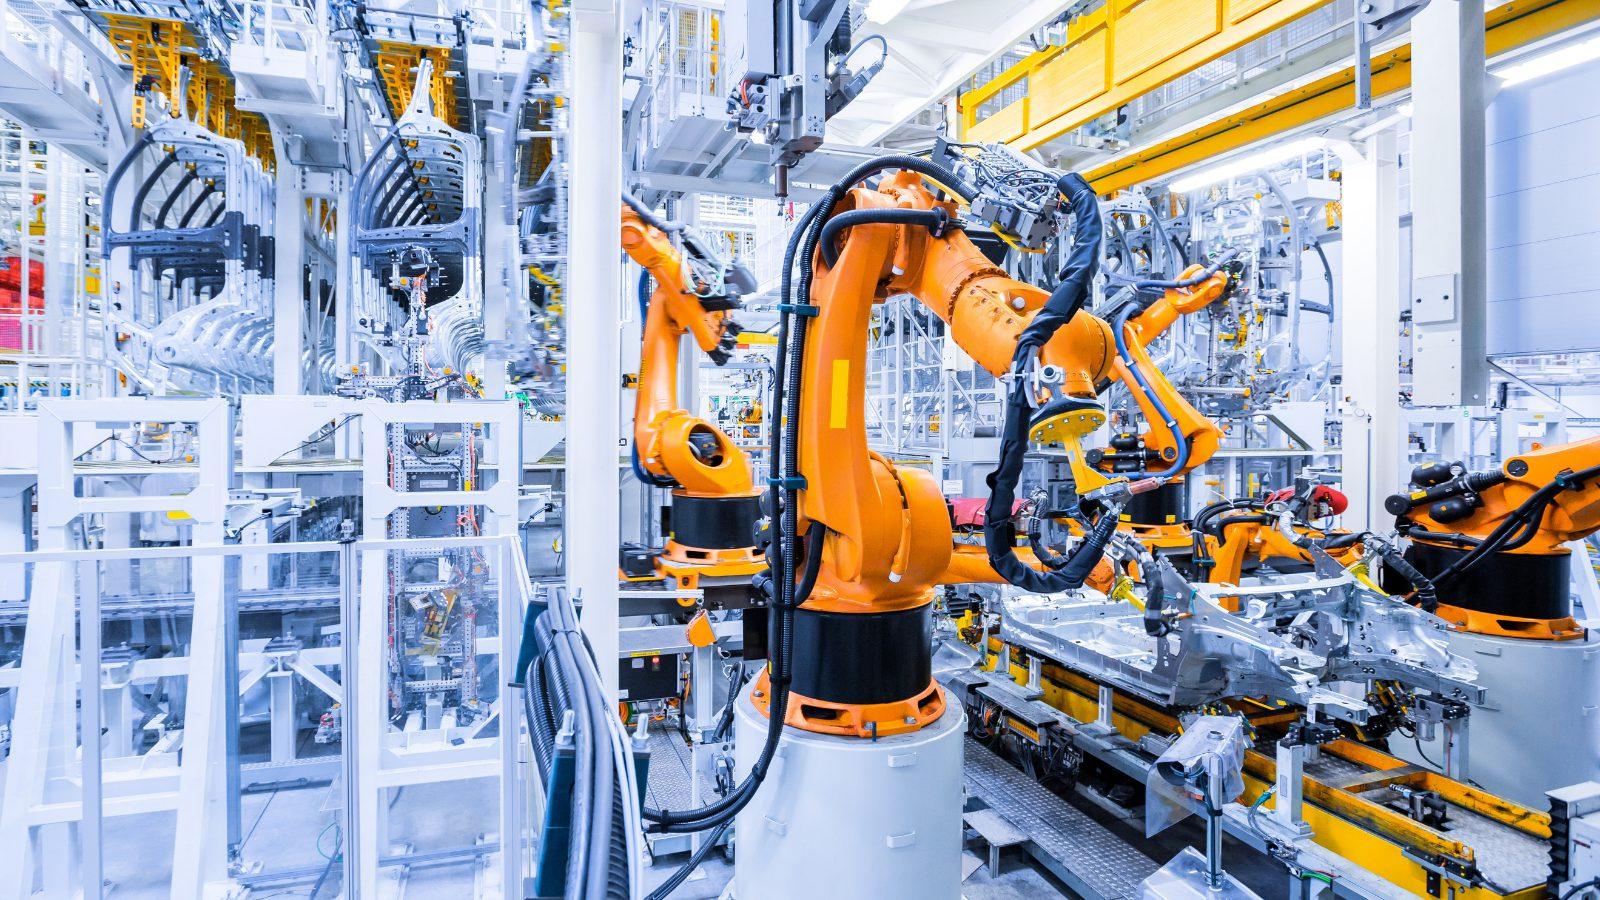 【DeepMind】強化学習を産業ロボットに応用するための秘策(AI×製造)